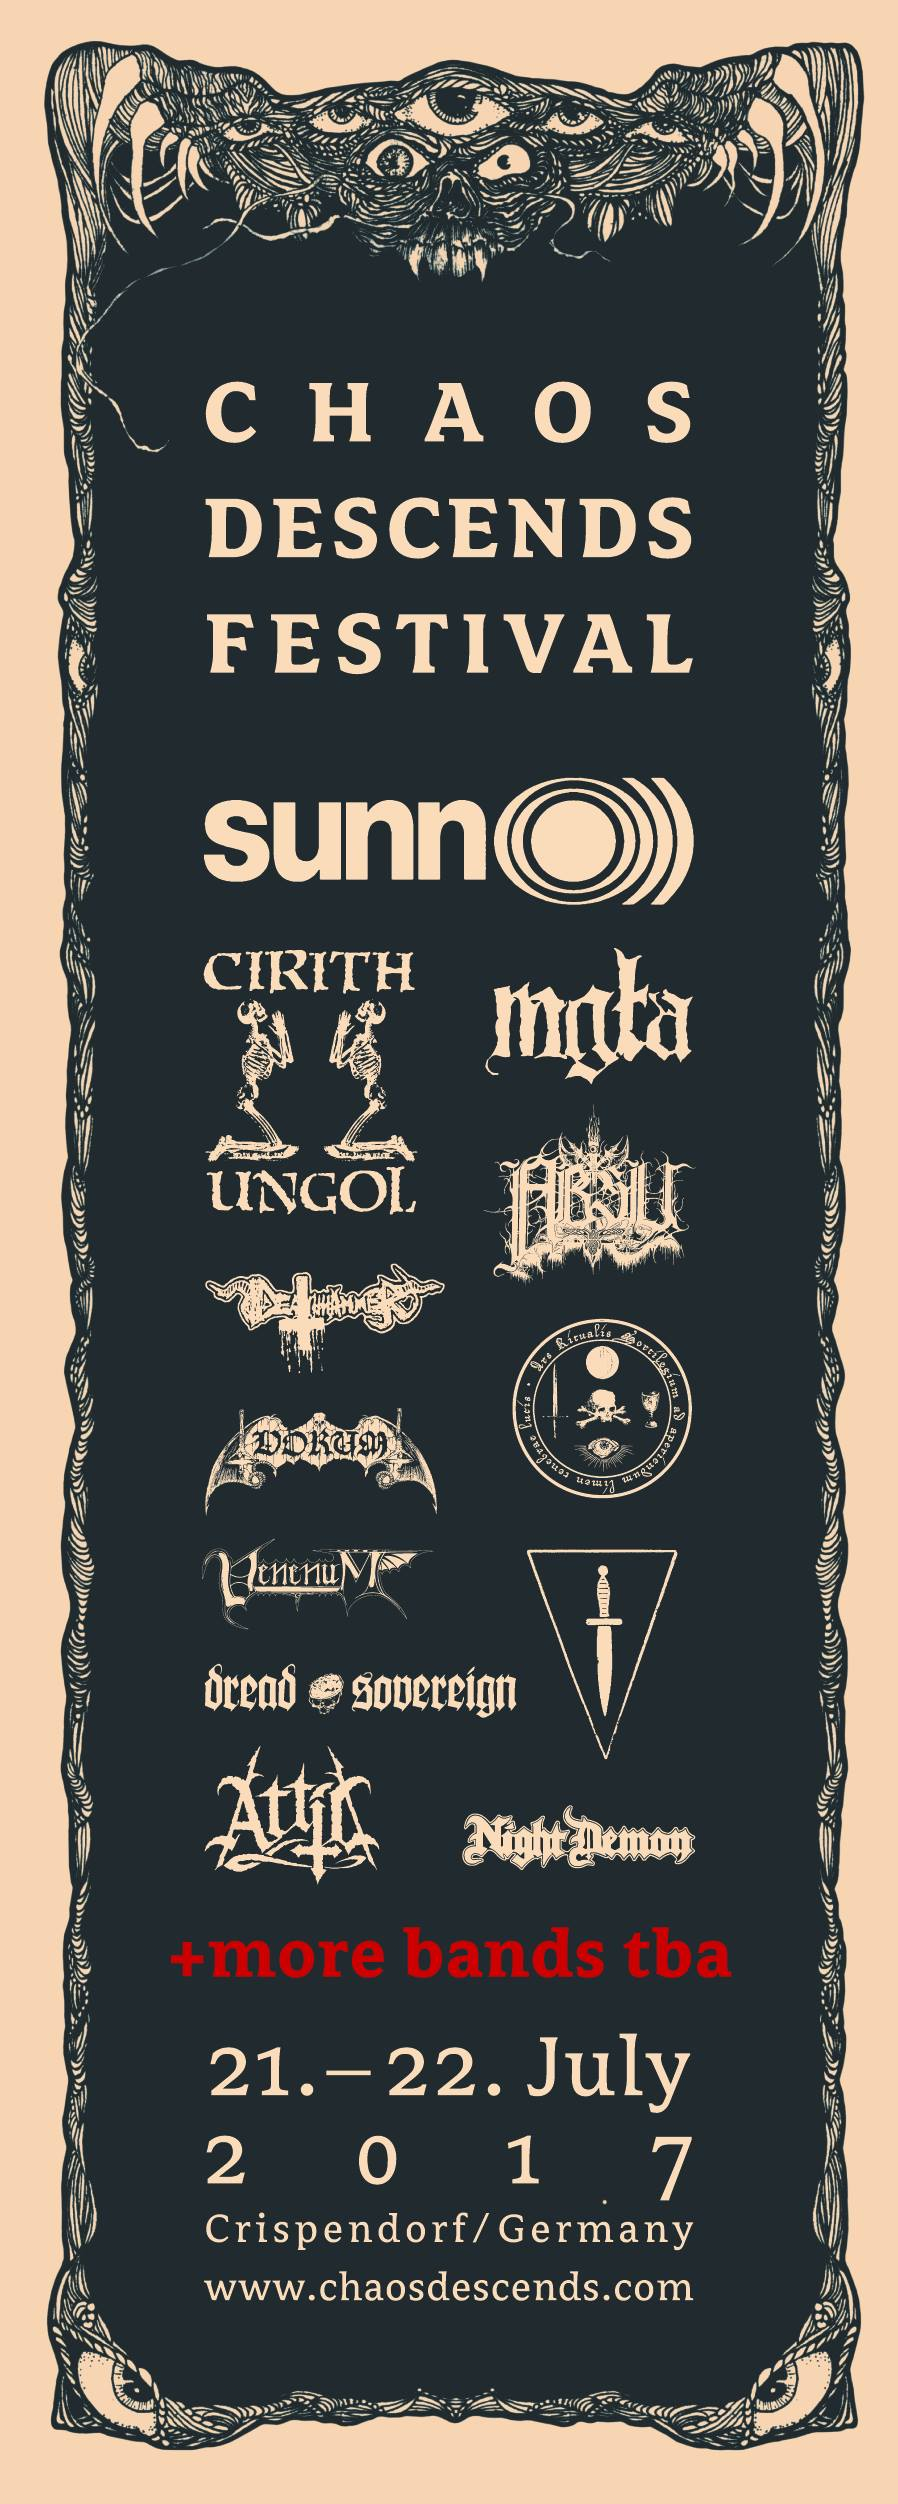 Chaos Descends Festival 2017